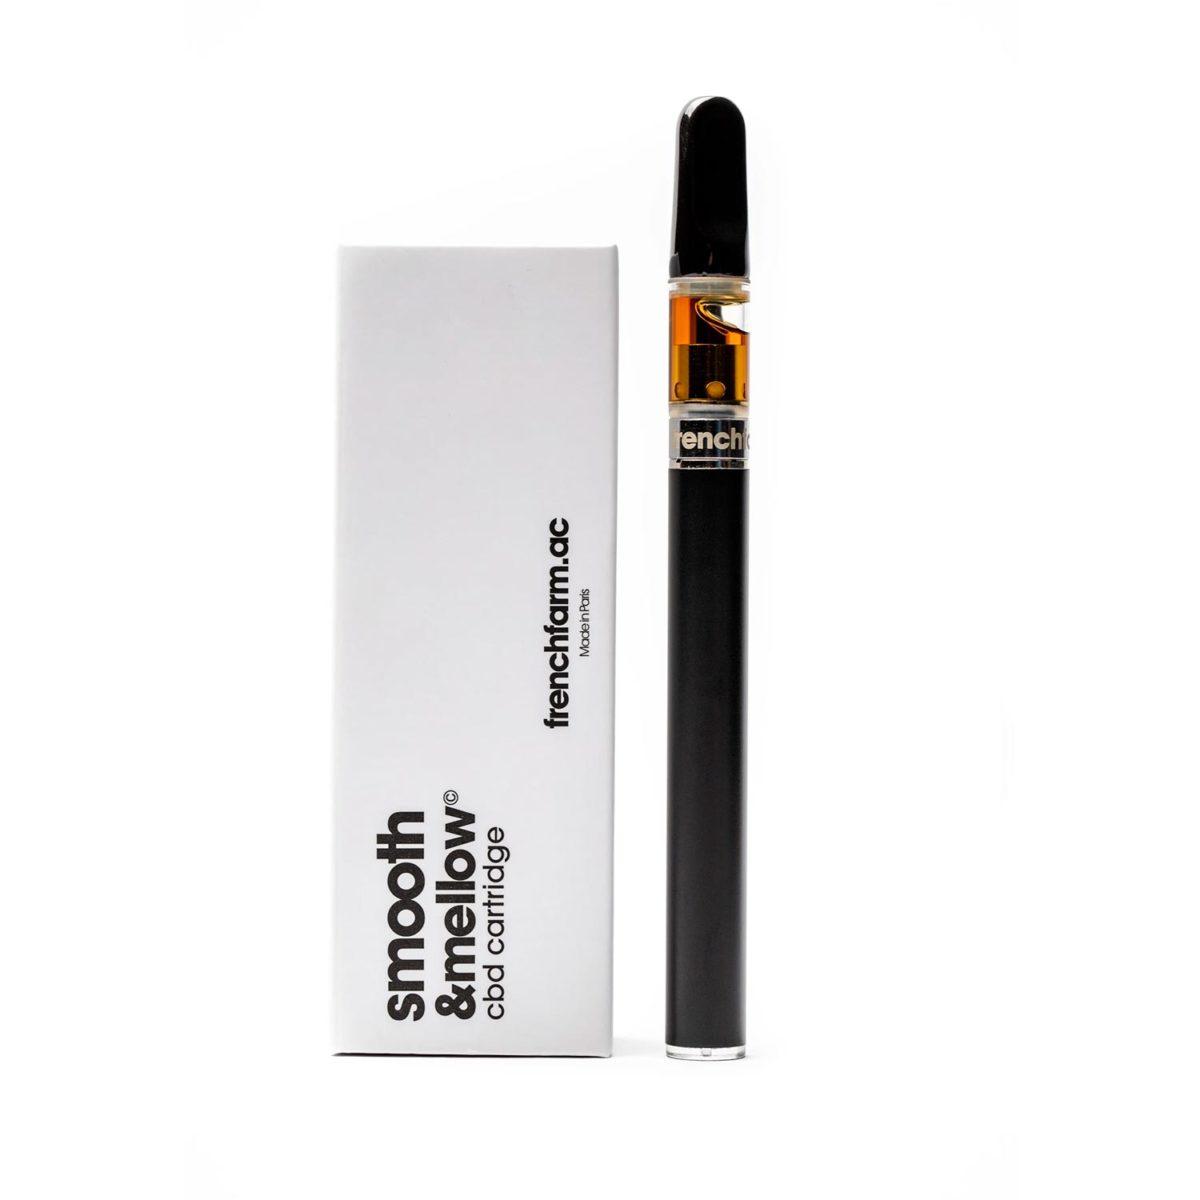 Cartouche CBD vape pen